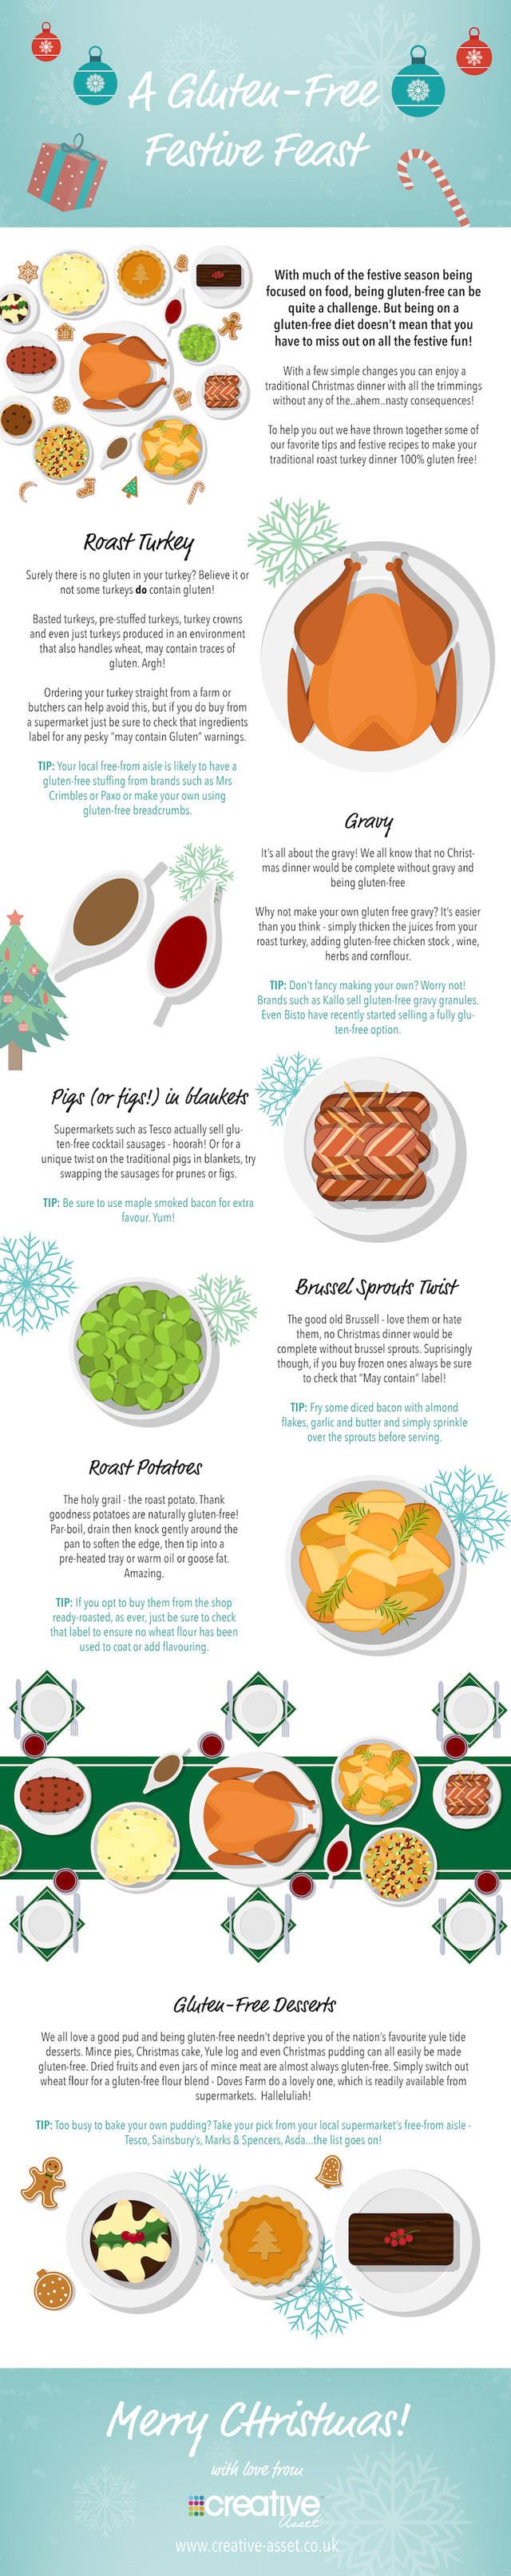 A Gluten-Free Christmas